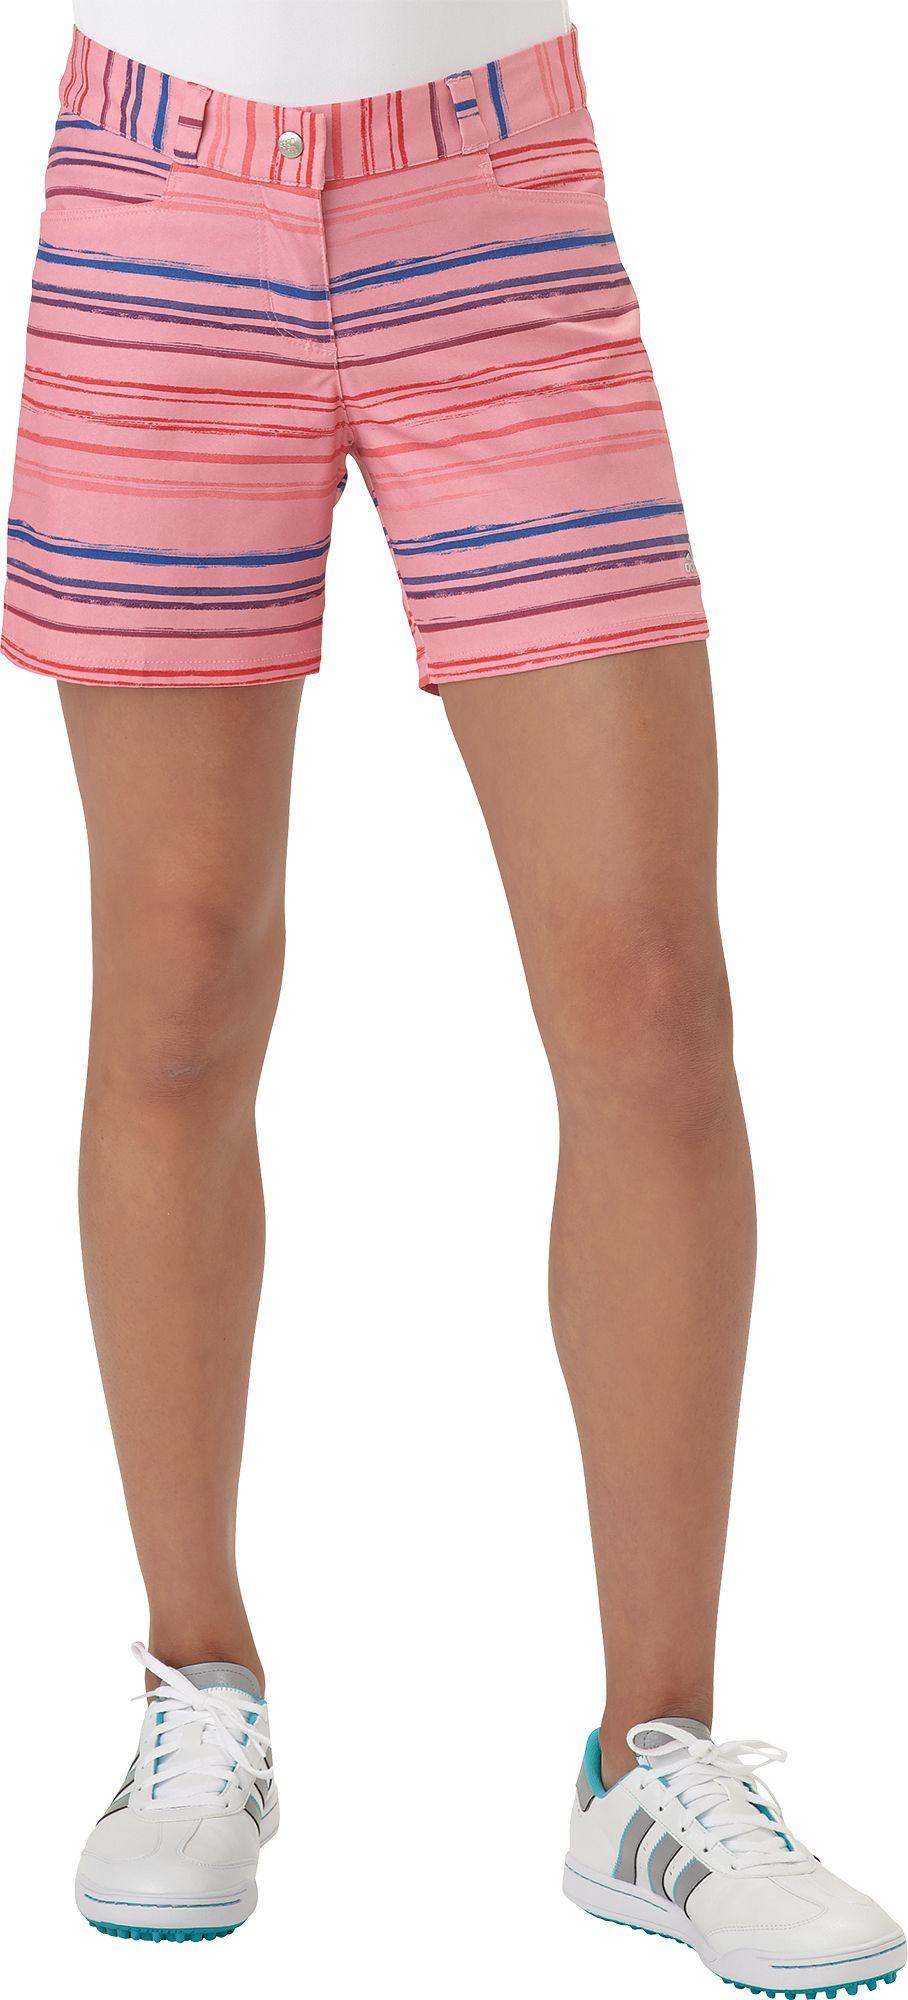 adidas Girls Paint Stripe Golf Shorts DICKS Sporting Goods